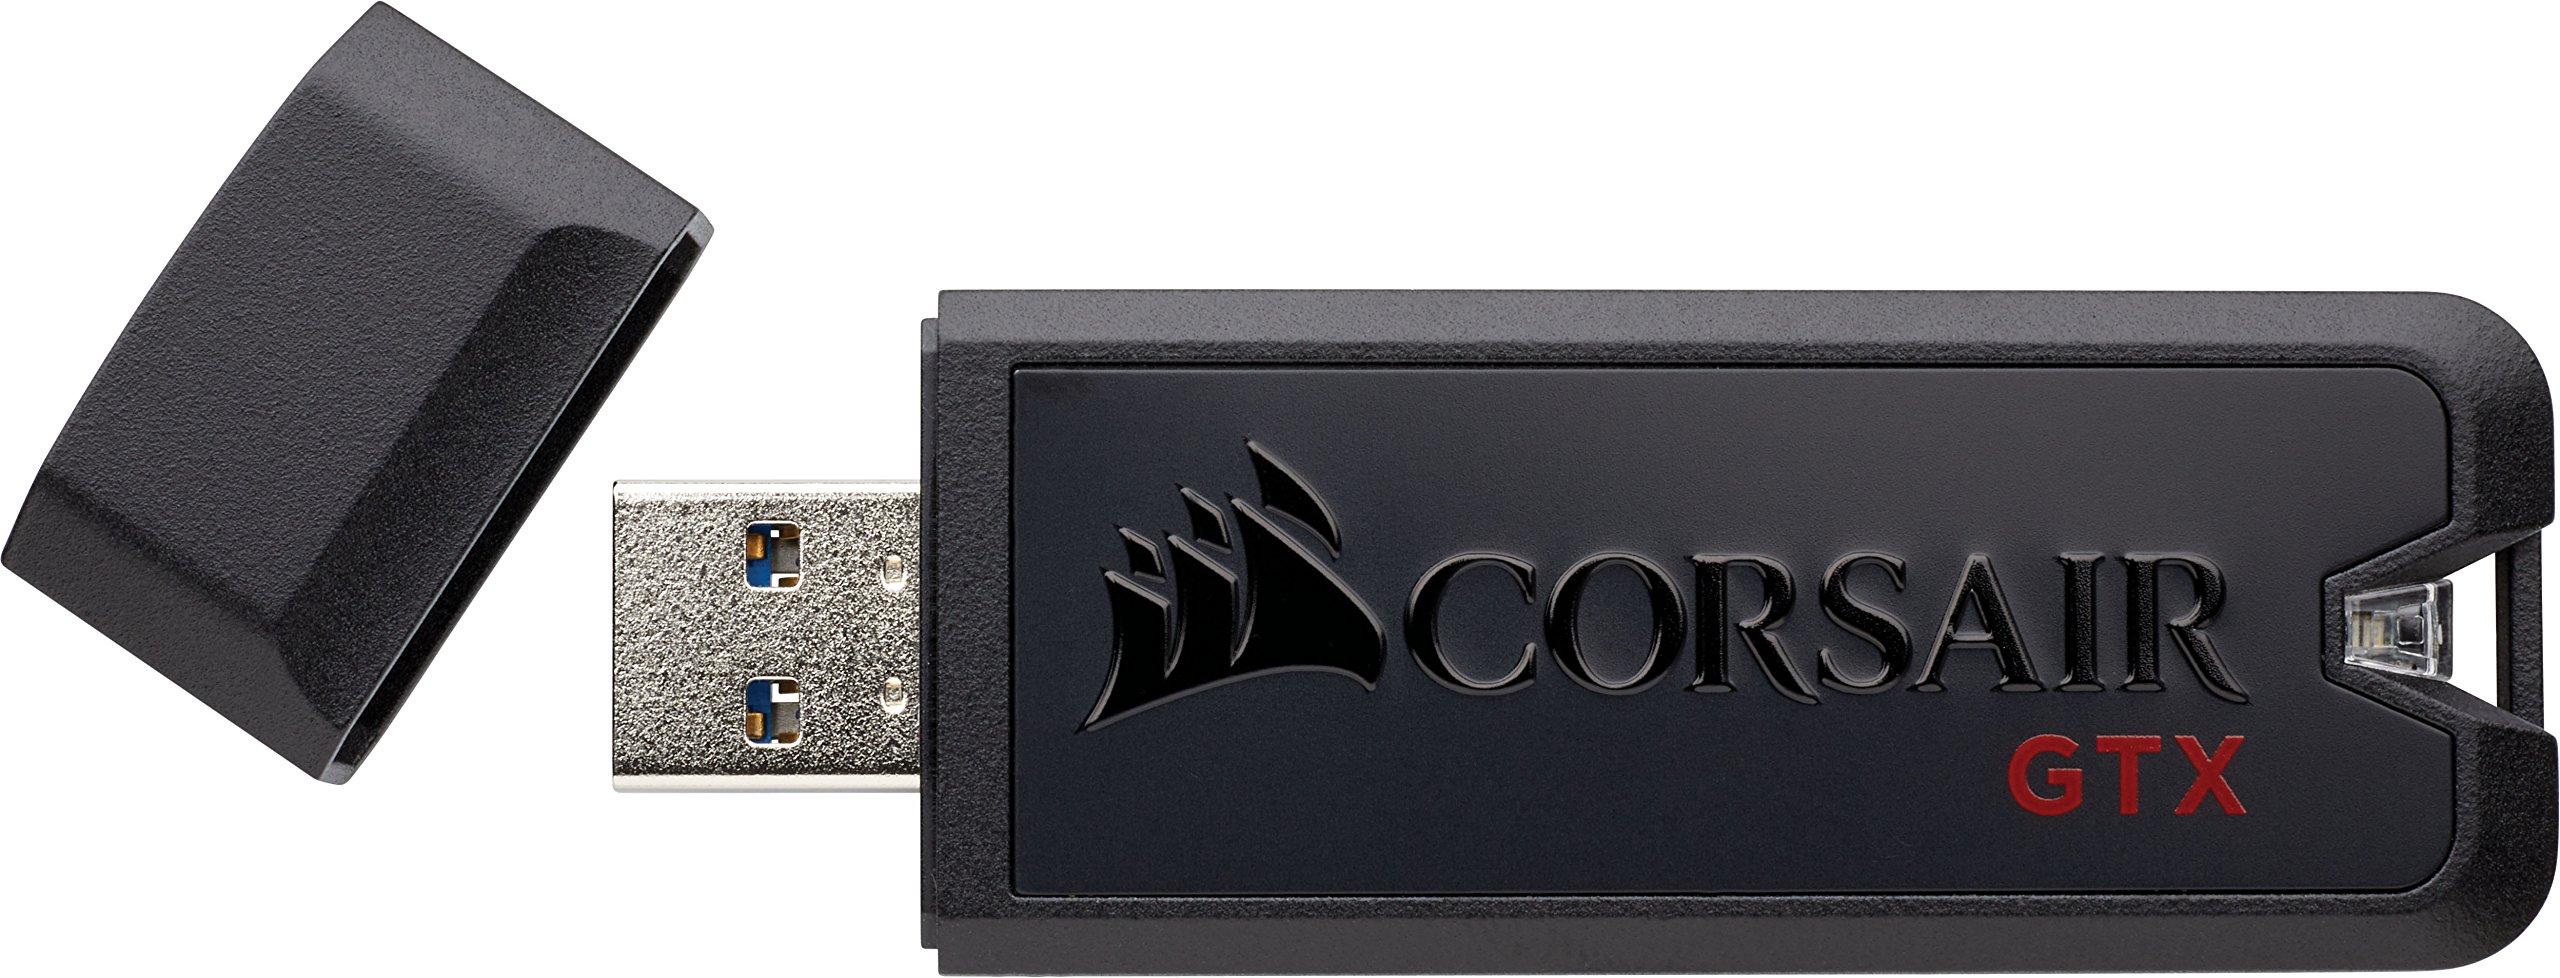 Corsair Flash Voyager GTX 128GB USB 3.1 Premium Flash Drive by Corsair (Image #3)